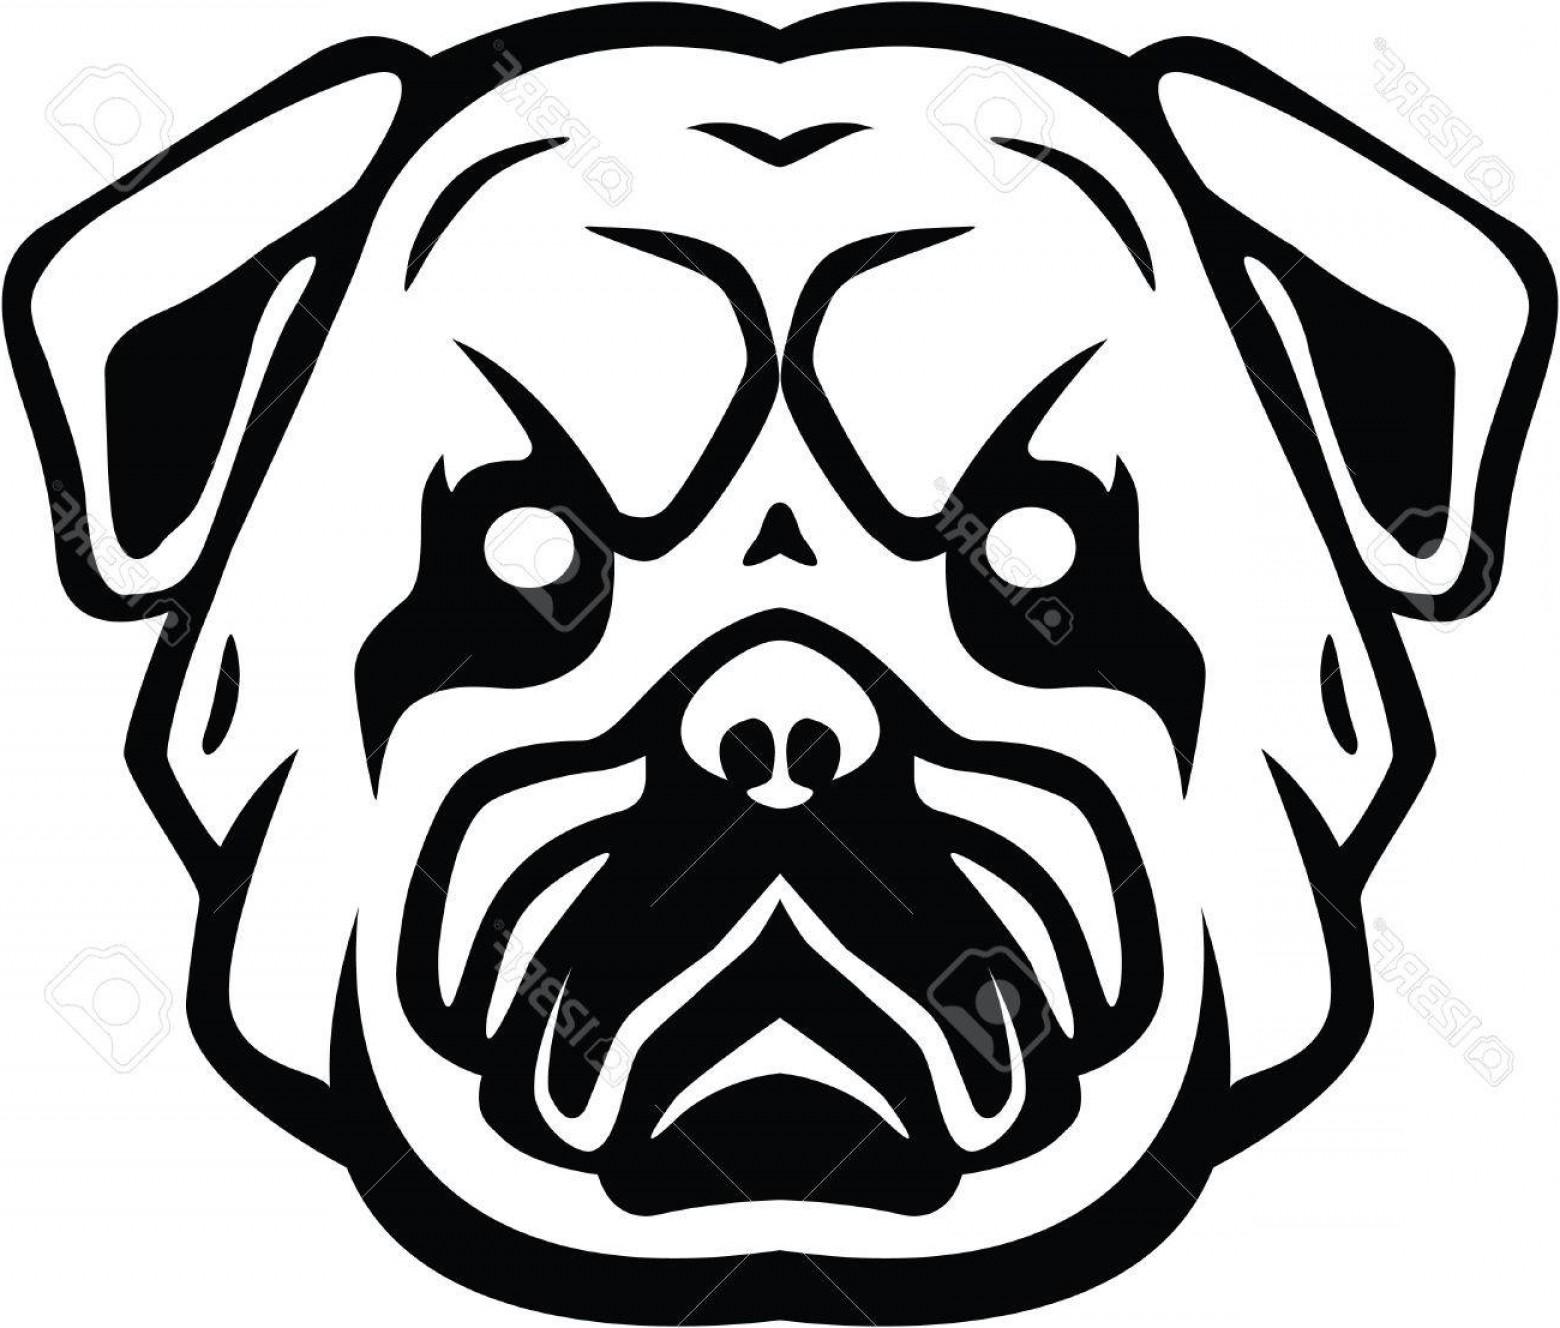 1560x1328 Photostock Vector Bulldog Head Symbol Illustration Arenawp